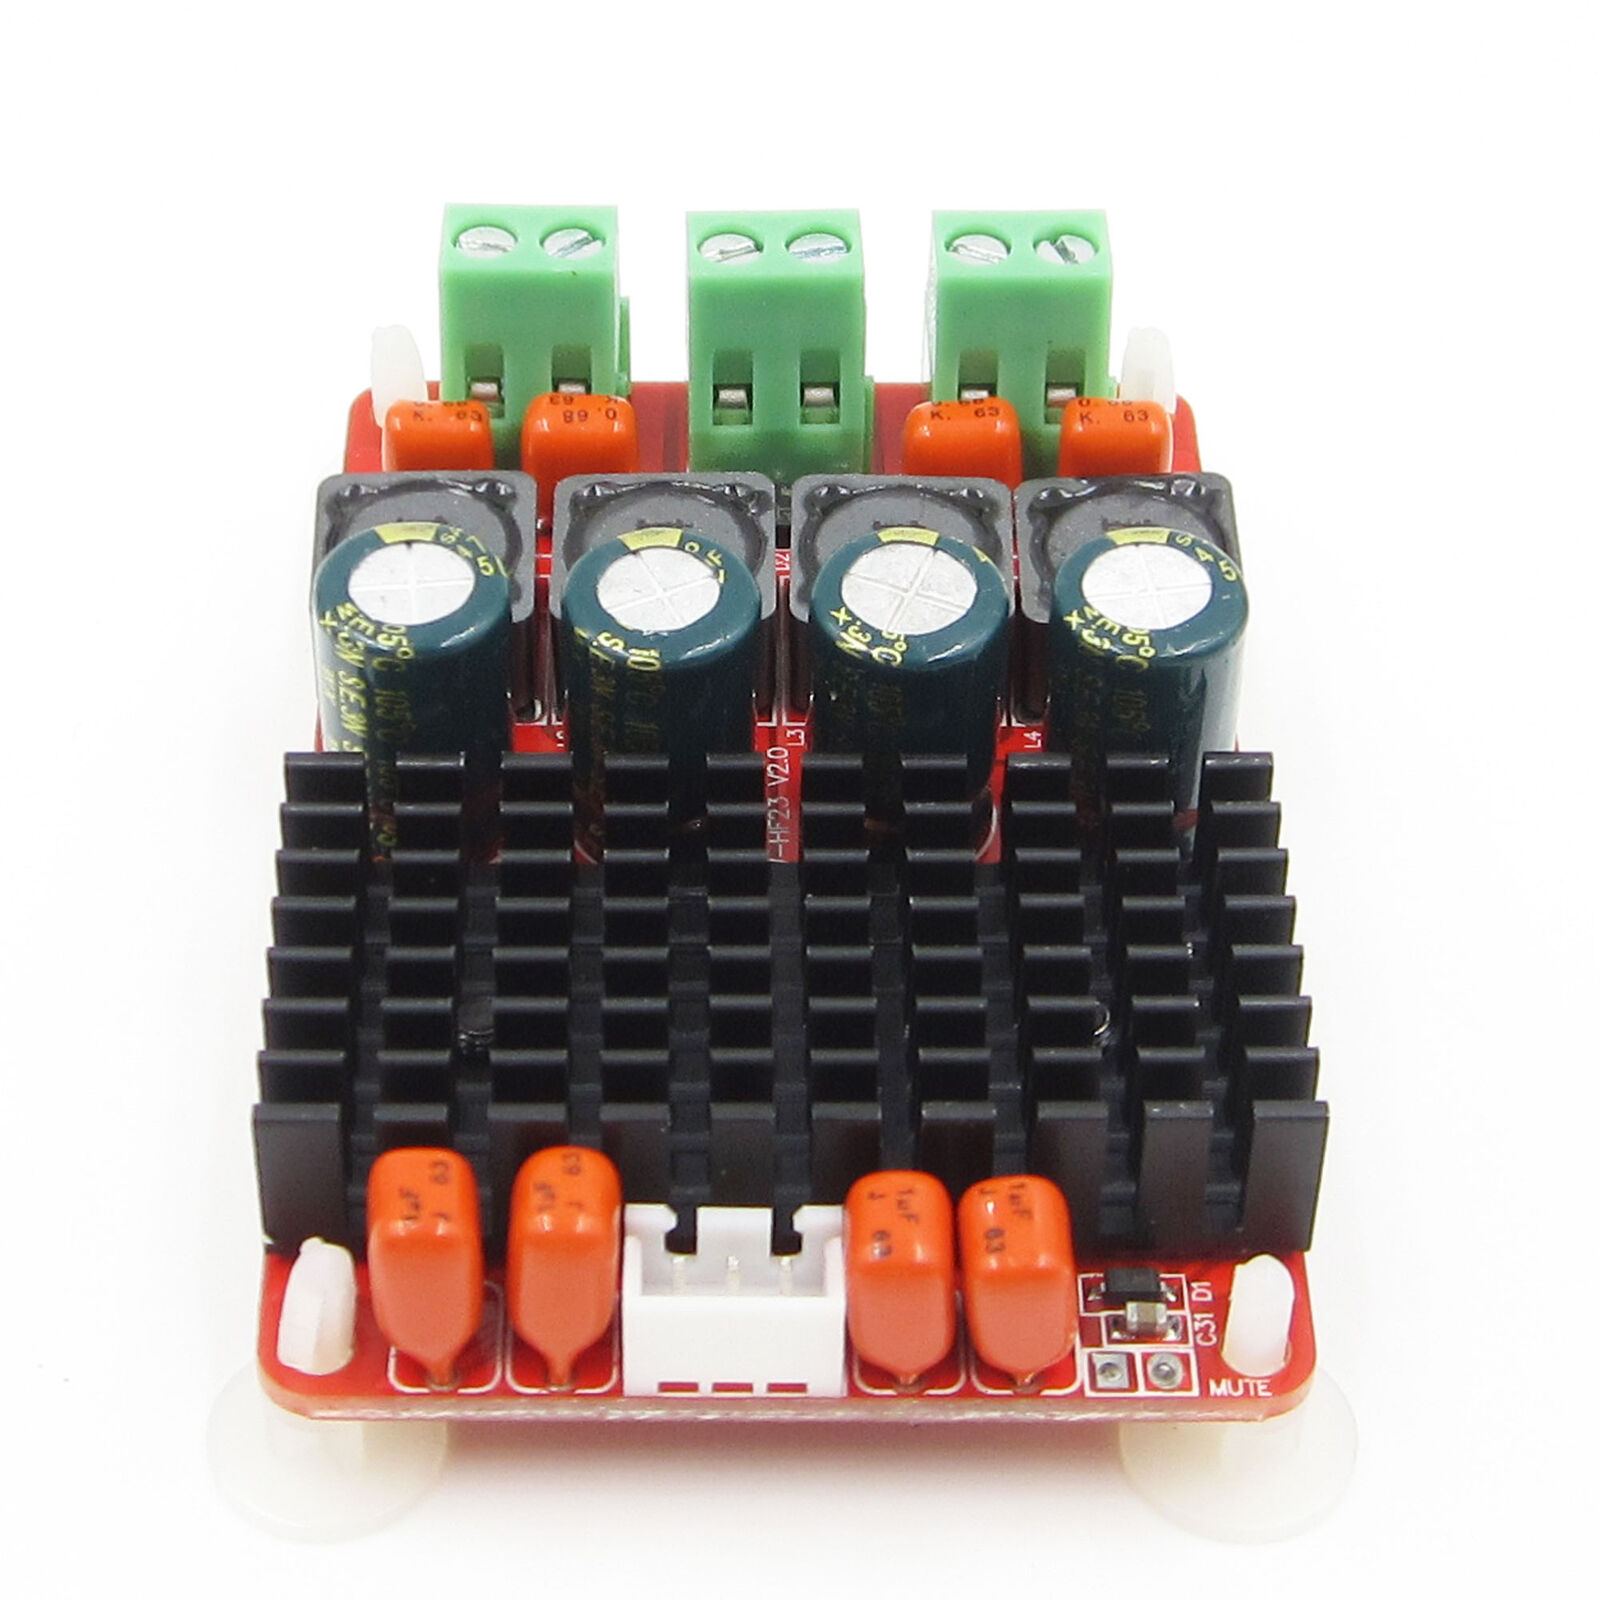 Dc 12 v 24 v tpa3116 mini placa de microplaqueta decodificador amplificador duplo canal estéreo 50 w * 2 btl mono 100 w para amplificador de cinema em casa